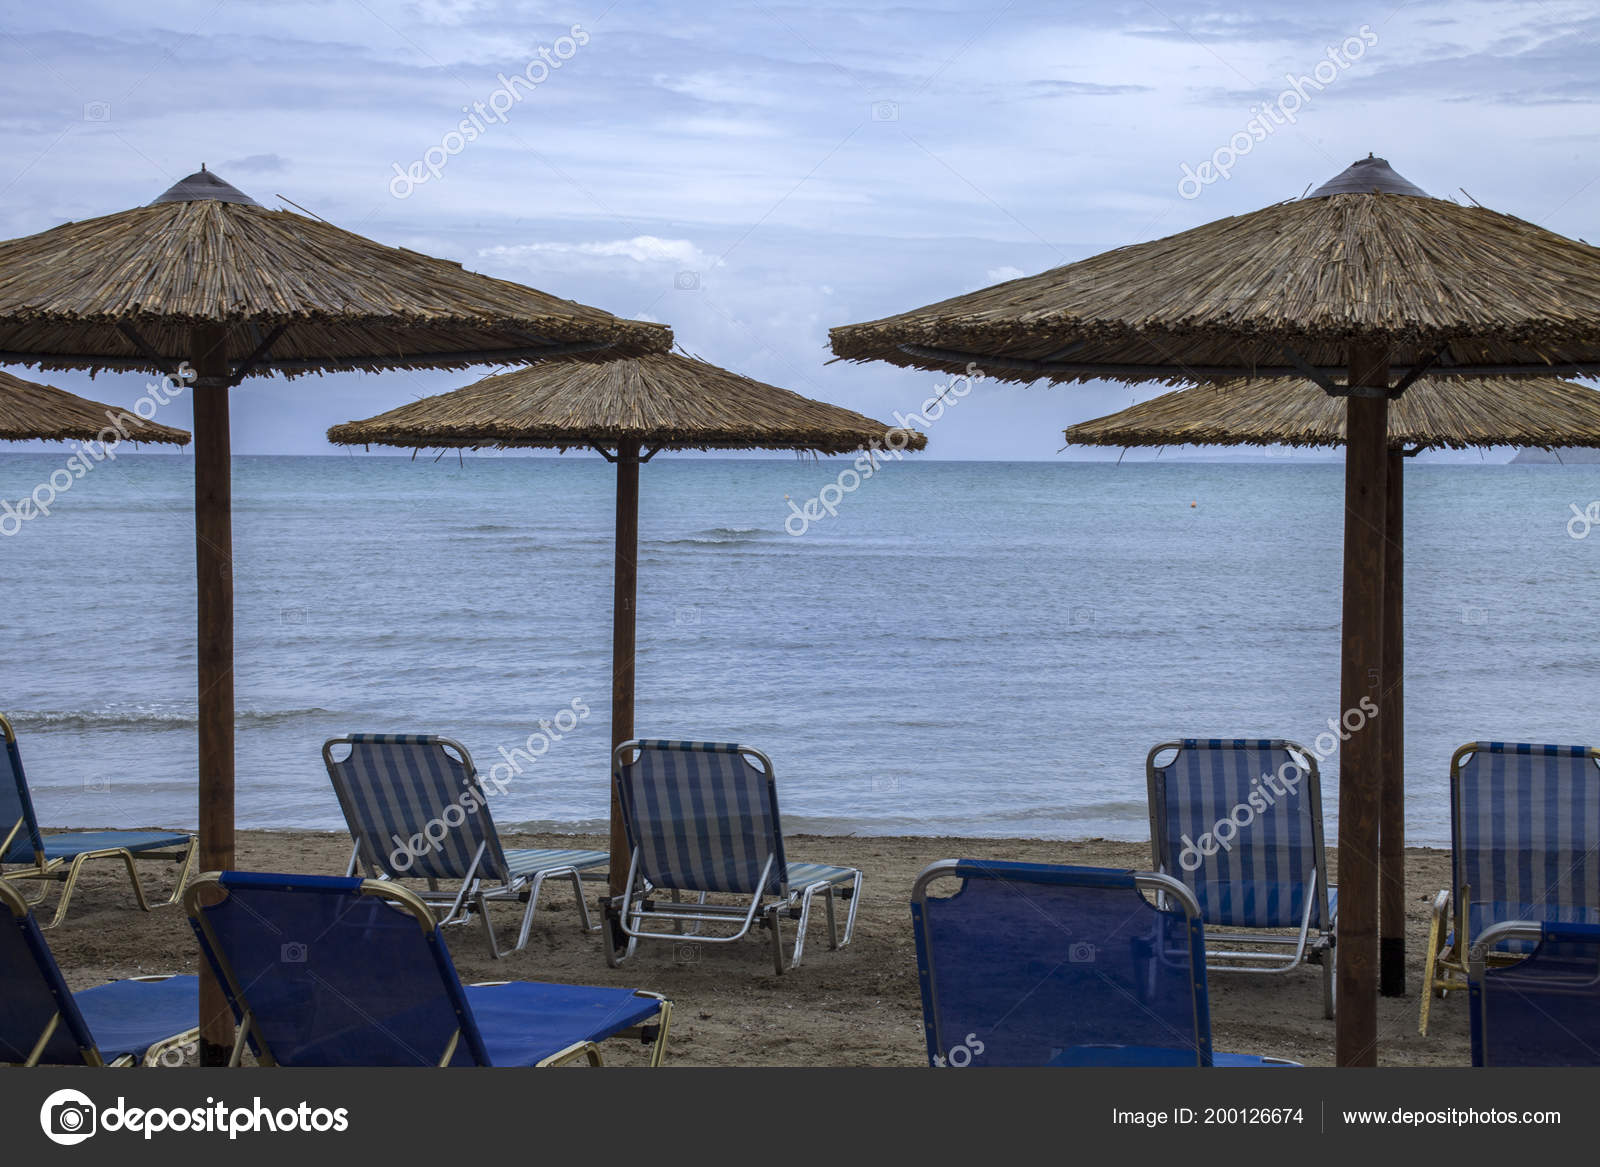 Estar Playa Lugar Resort Cristalina Vistas Azul Buena Agua P80wkXnO